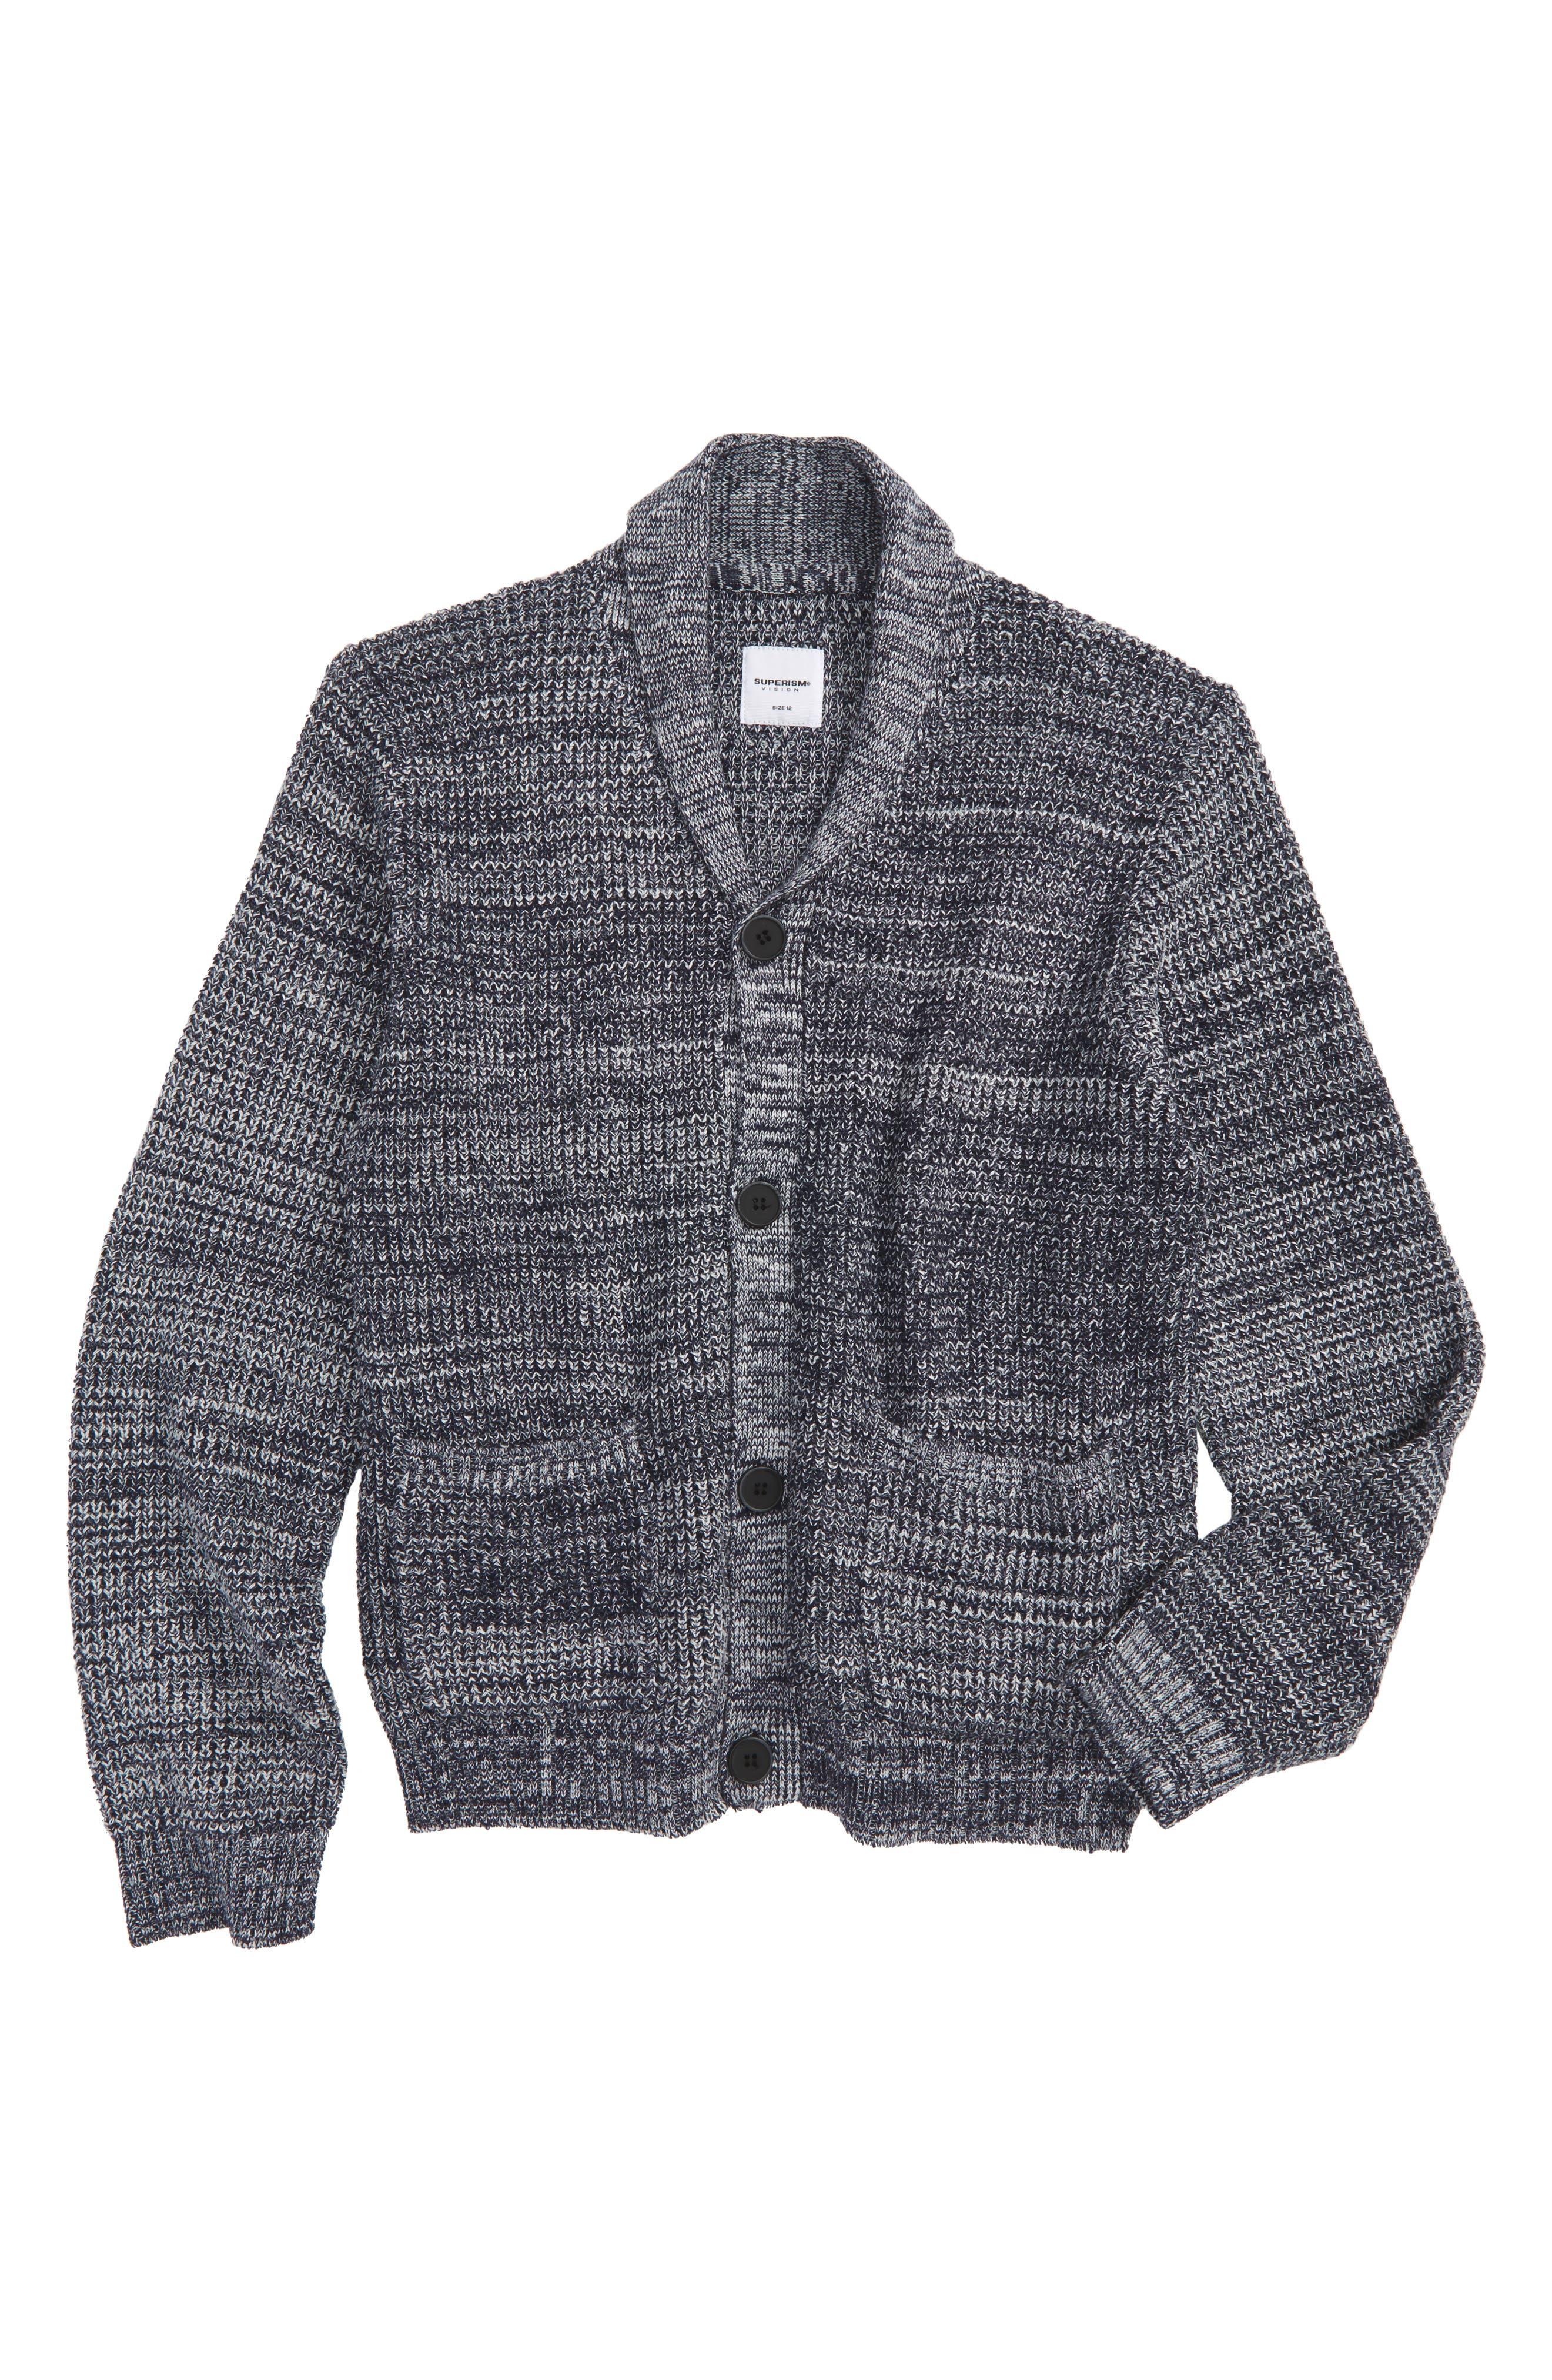 Cruz Cardigan Sweater,                             Main thumbnail 1, color,                             Navy